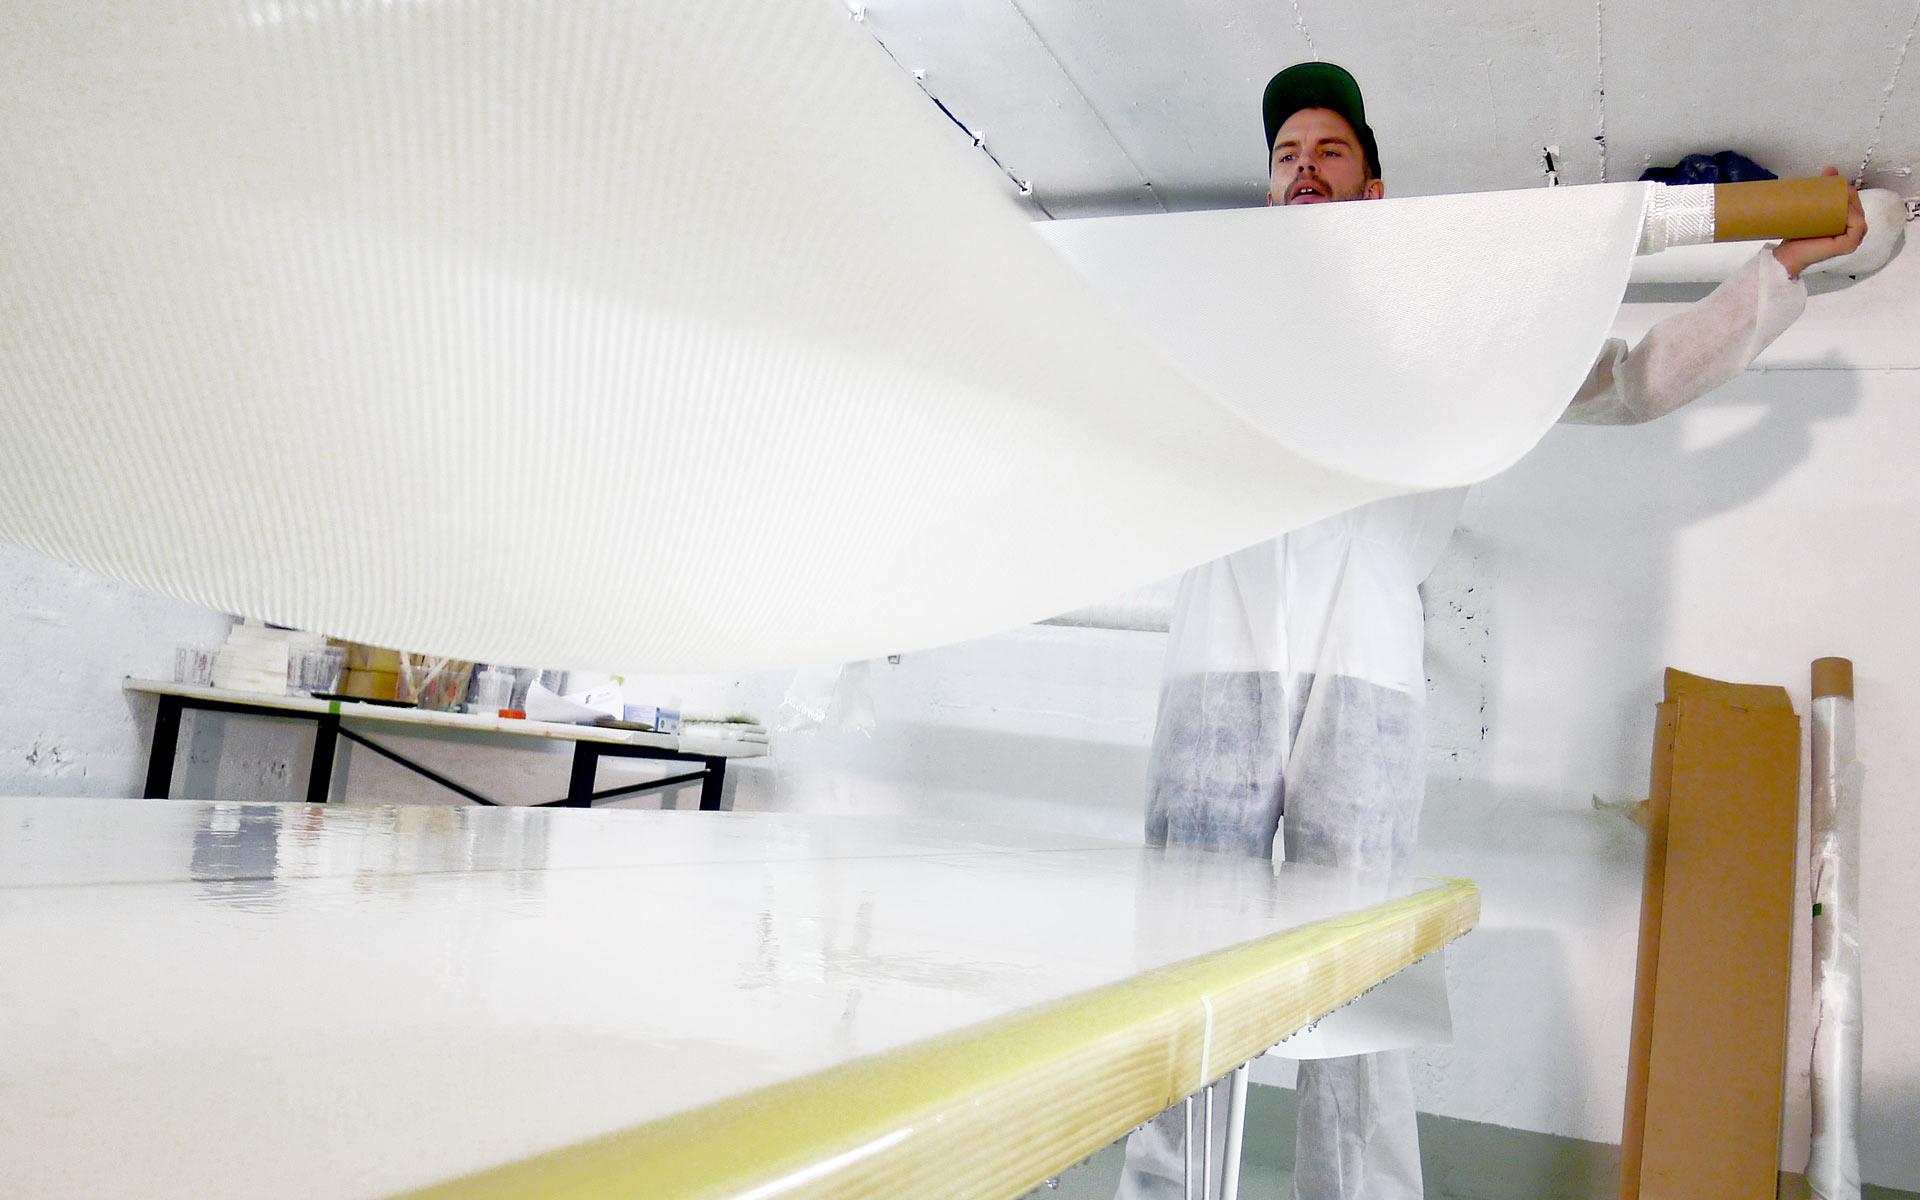 neunoy Corporate Design, Herstellungsprozess, Beschichtung